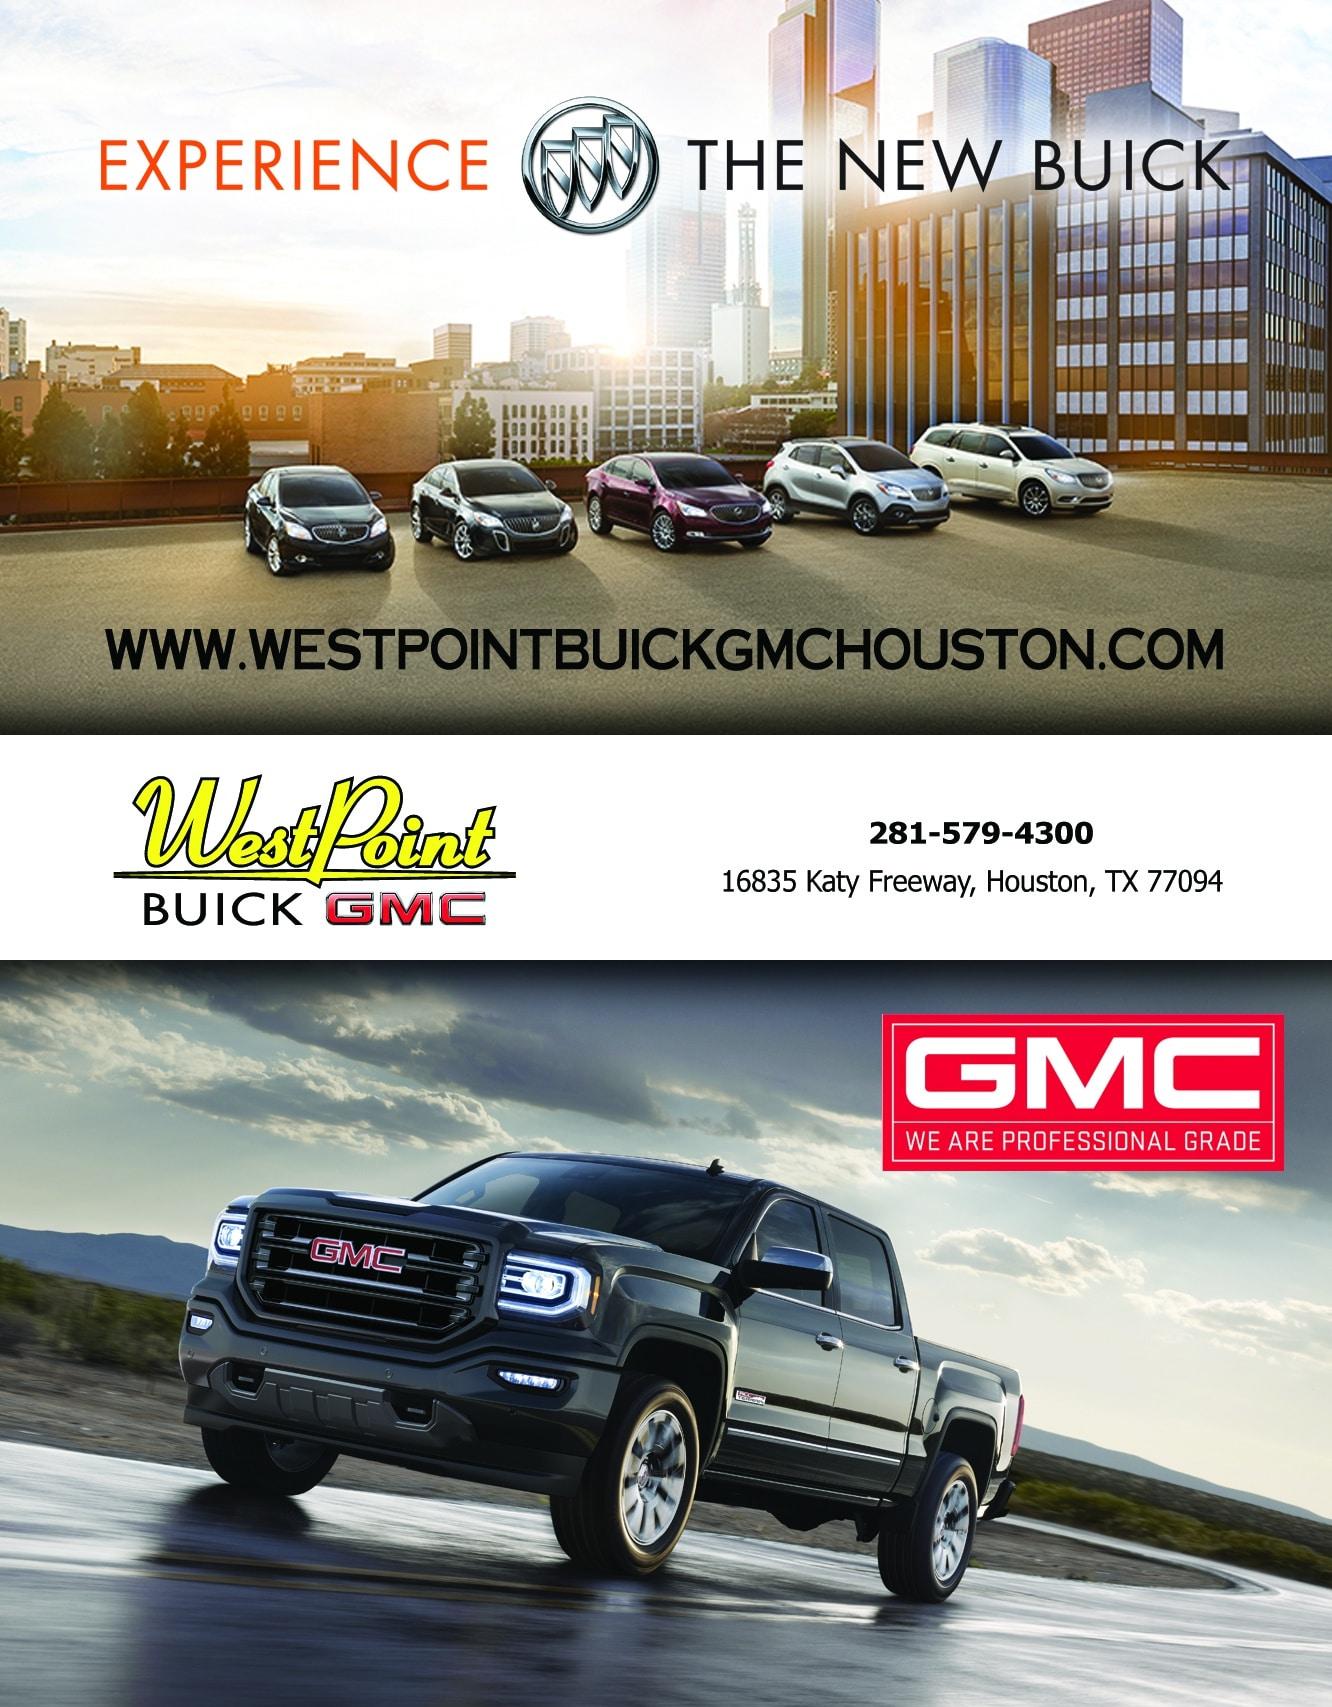 Westpoint Buick GMC Ad